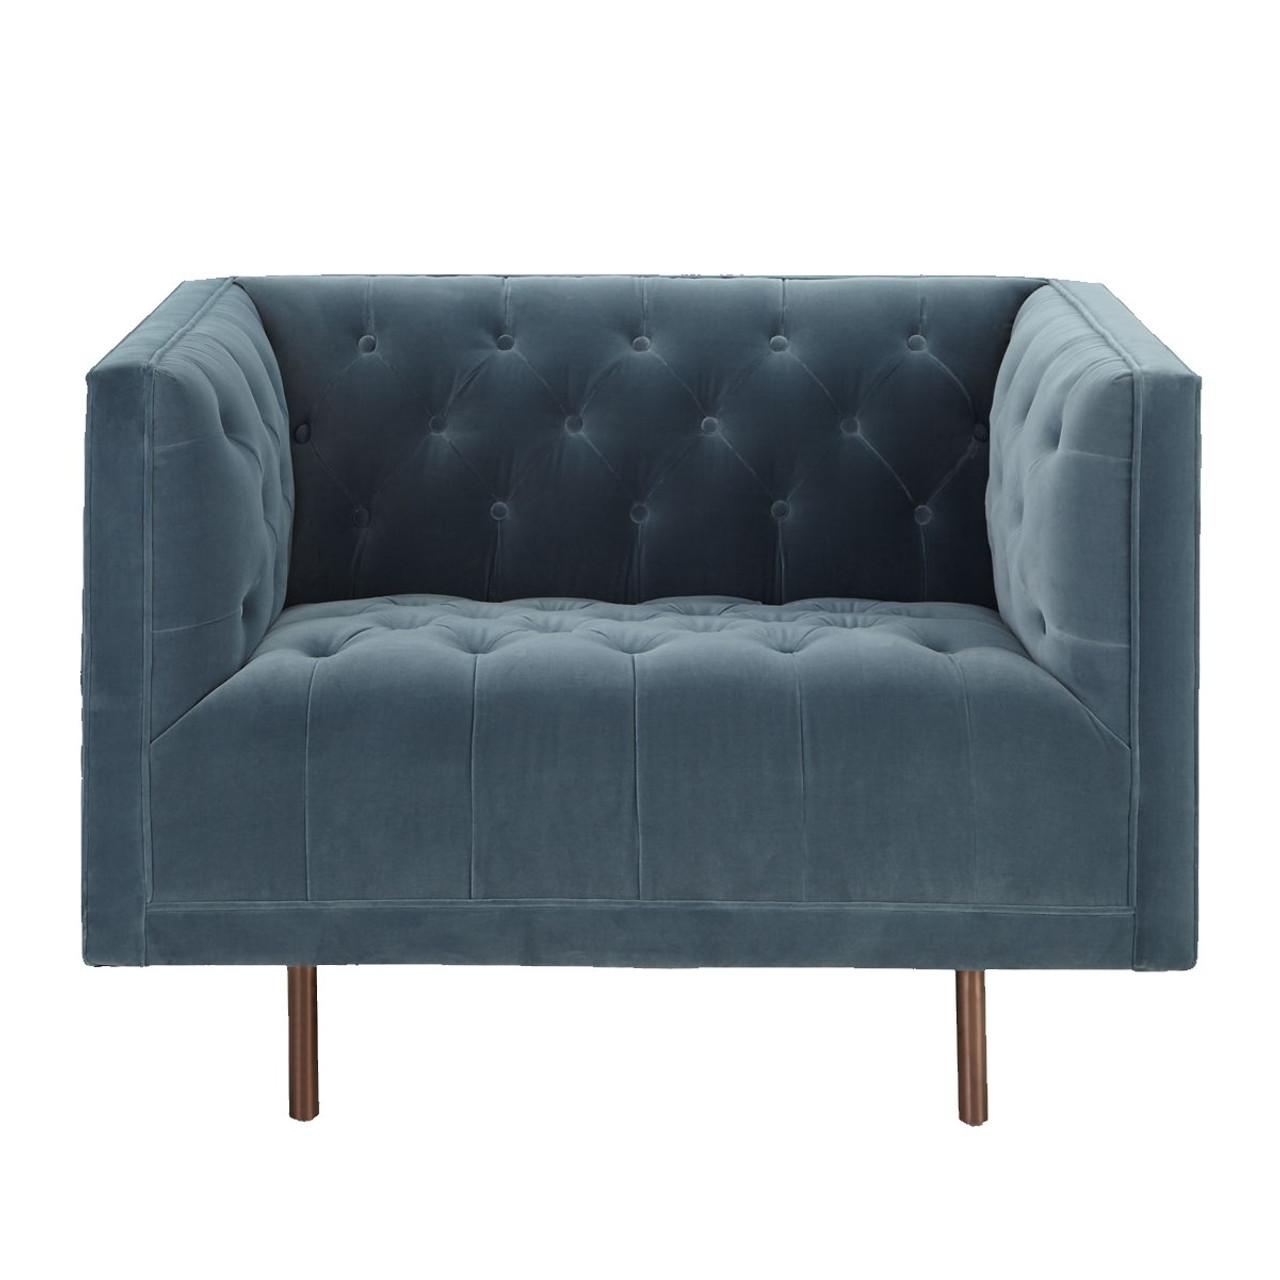 Astounding Lynette Blue Velvet Tufted Lounge Chair Machost Co Dining Chair Design Ideas Machostcouk